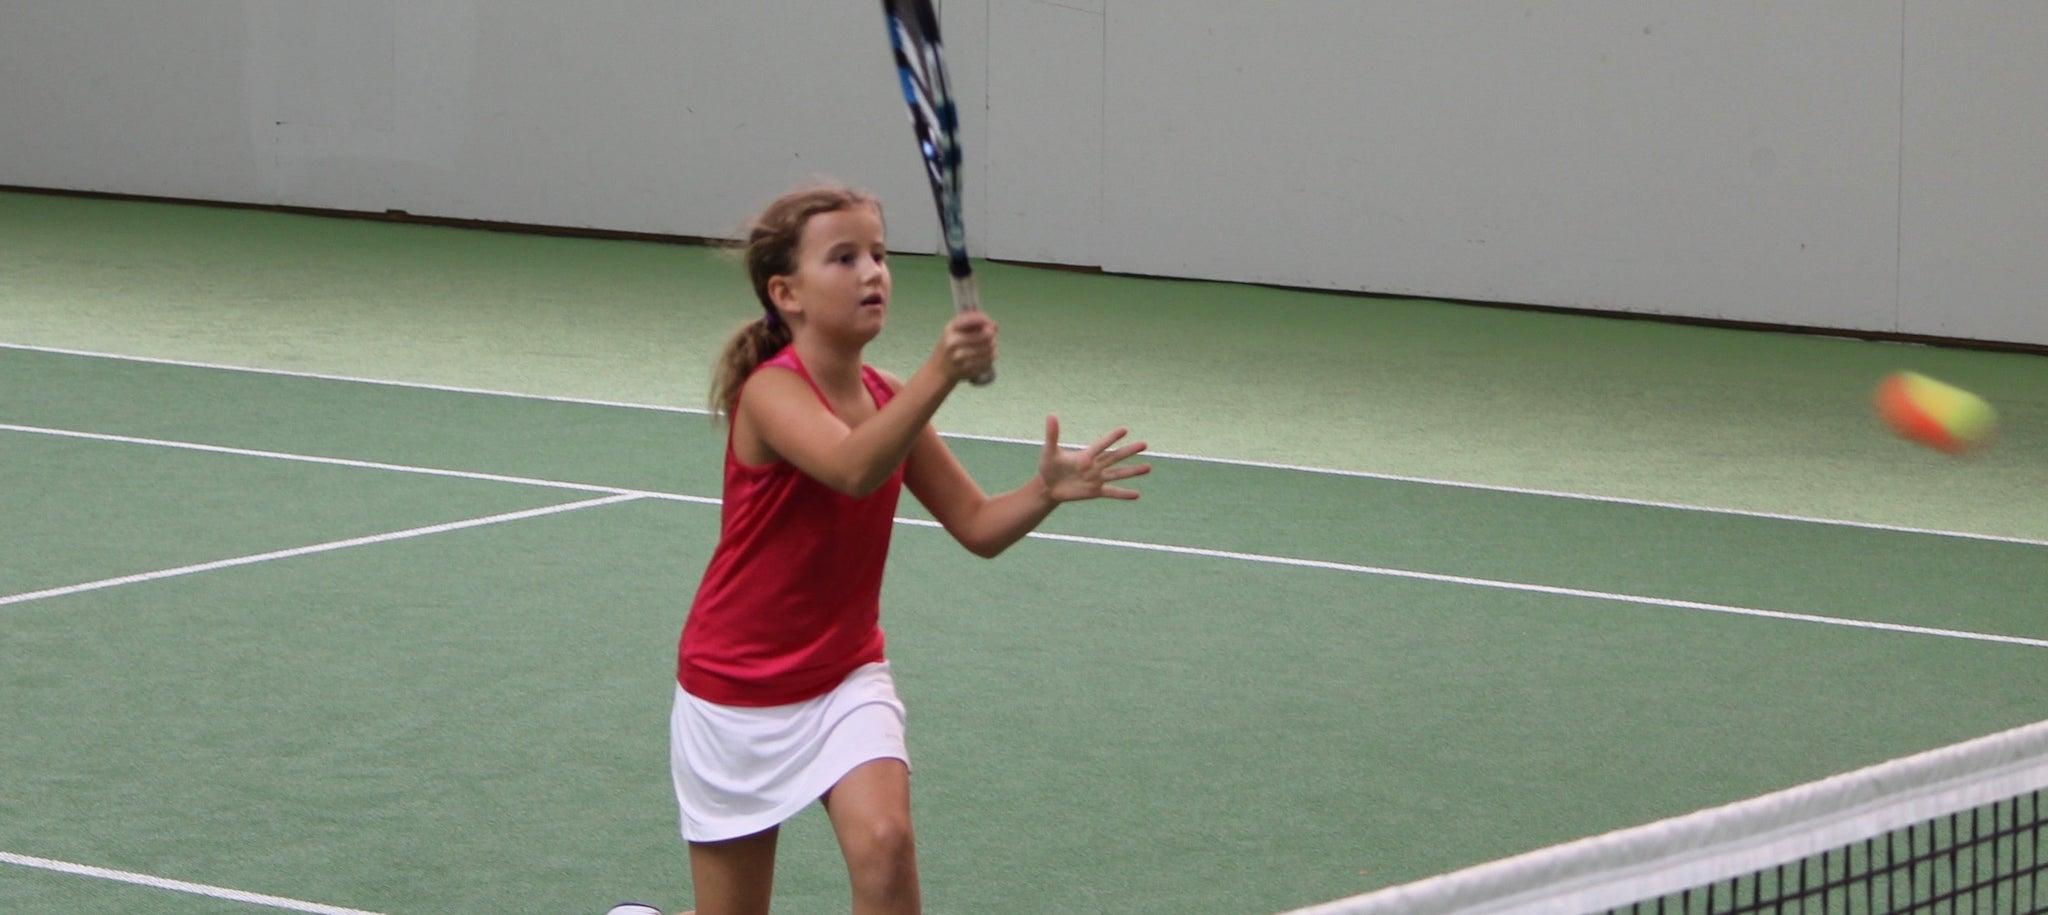 Mädchen kurz bevor es den Tennisball trifft